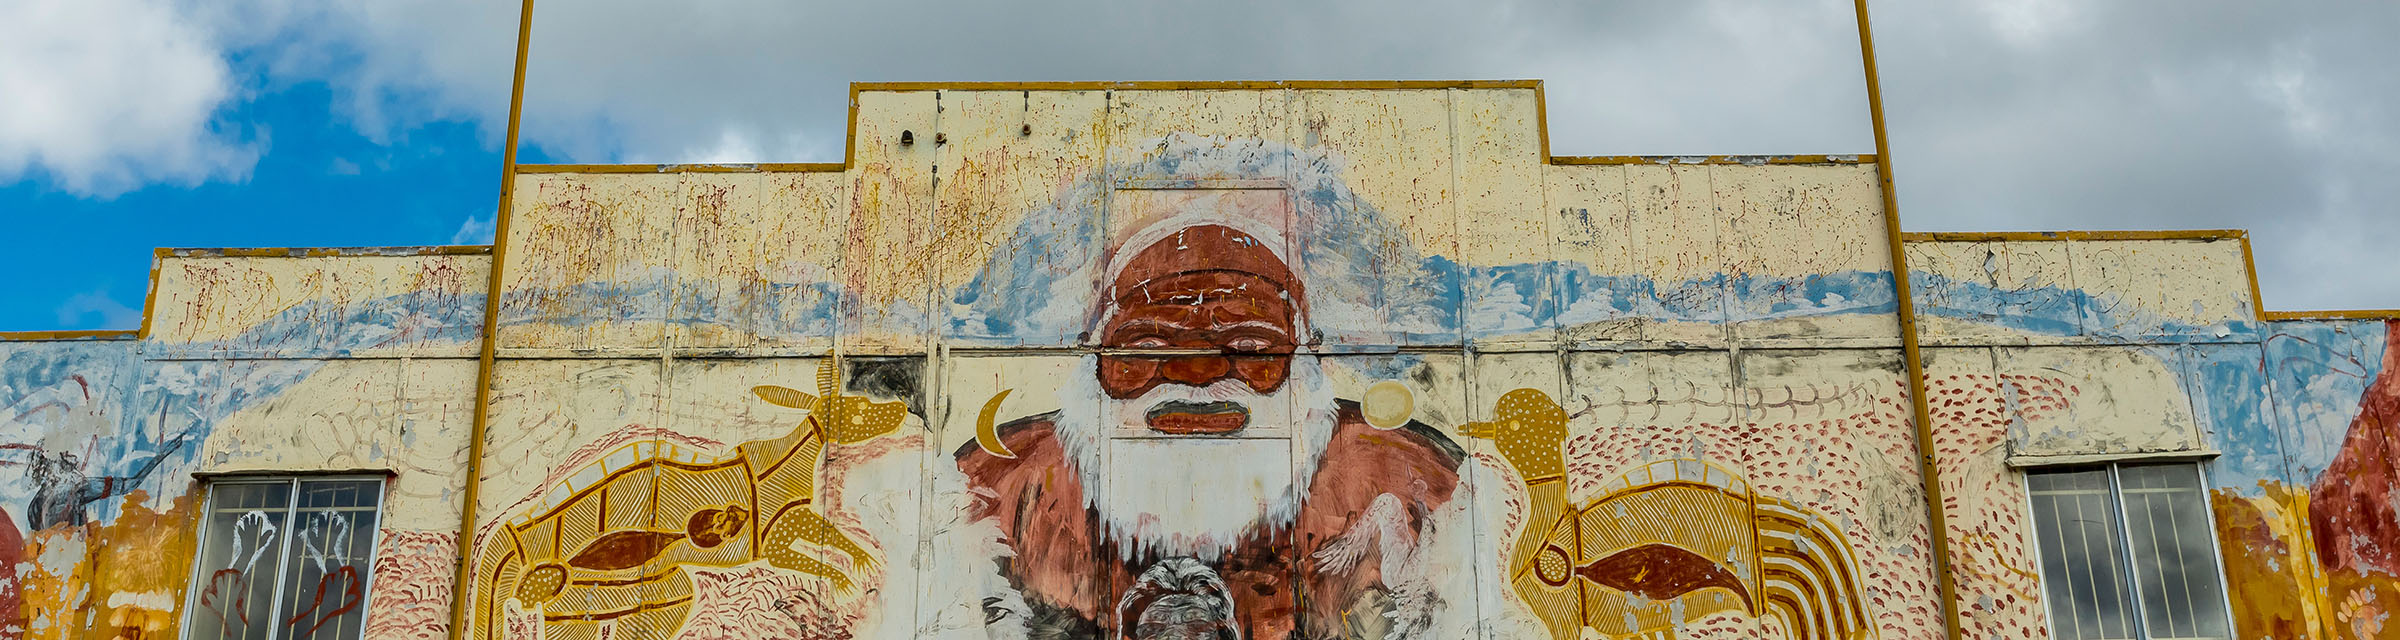 History and Culture | North Burnett Regional Council